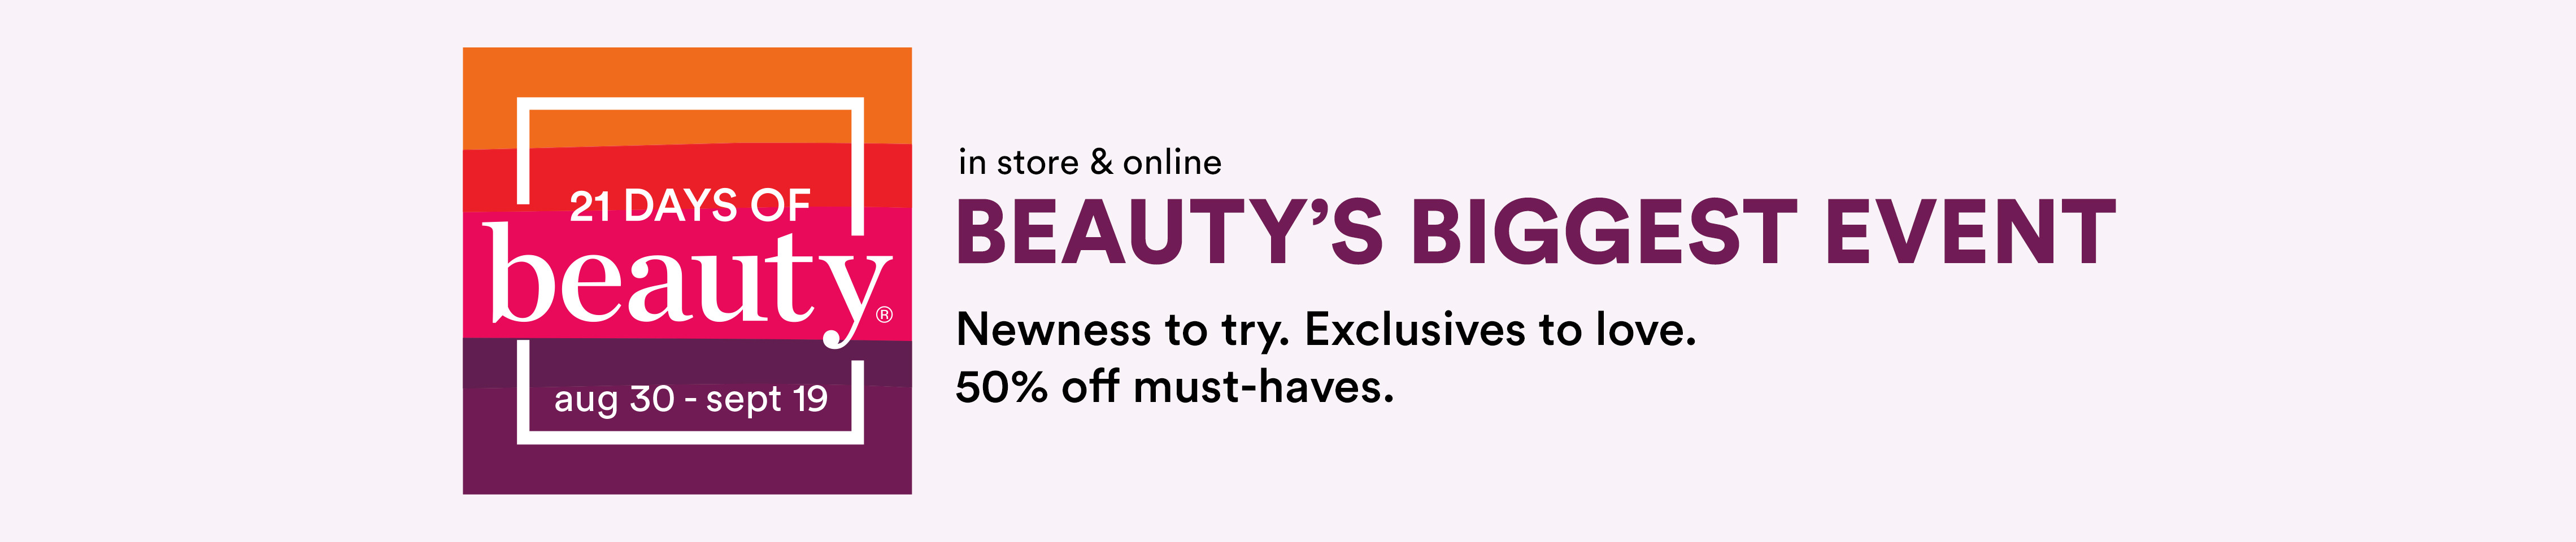 21 Days Of Beauty 2020 Ulta Beauty